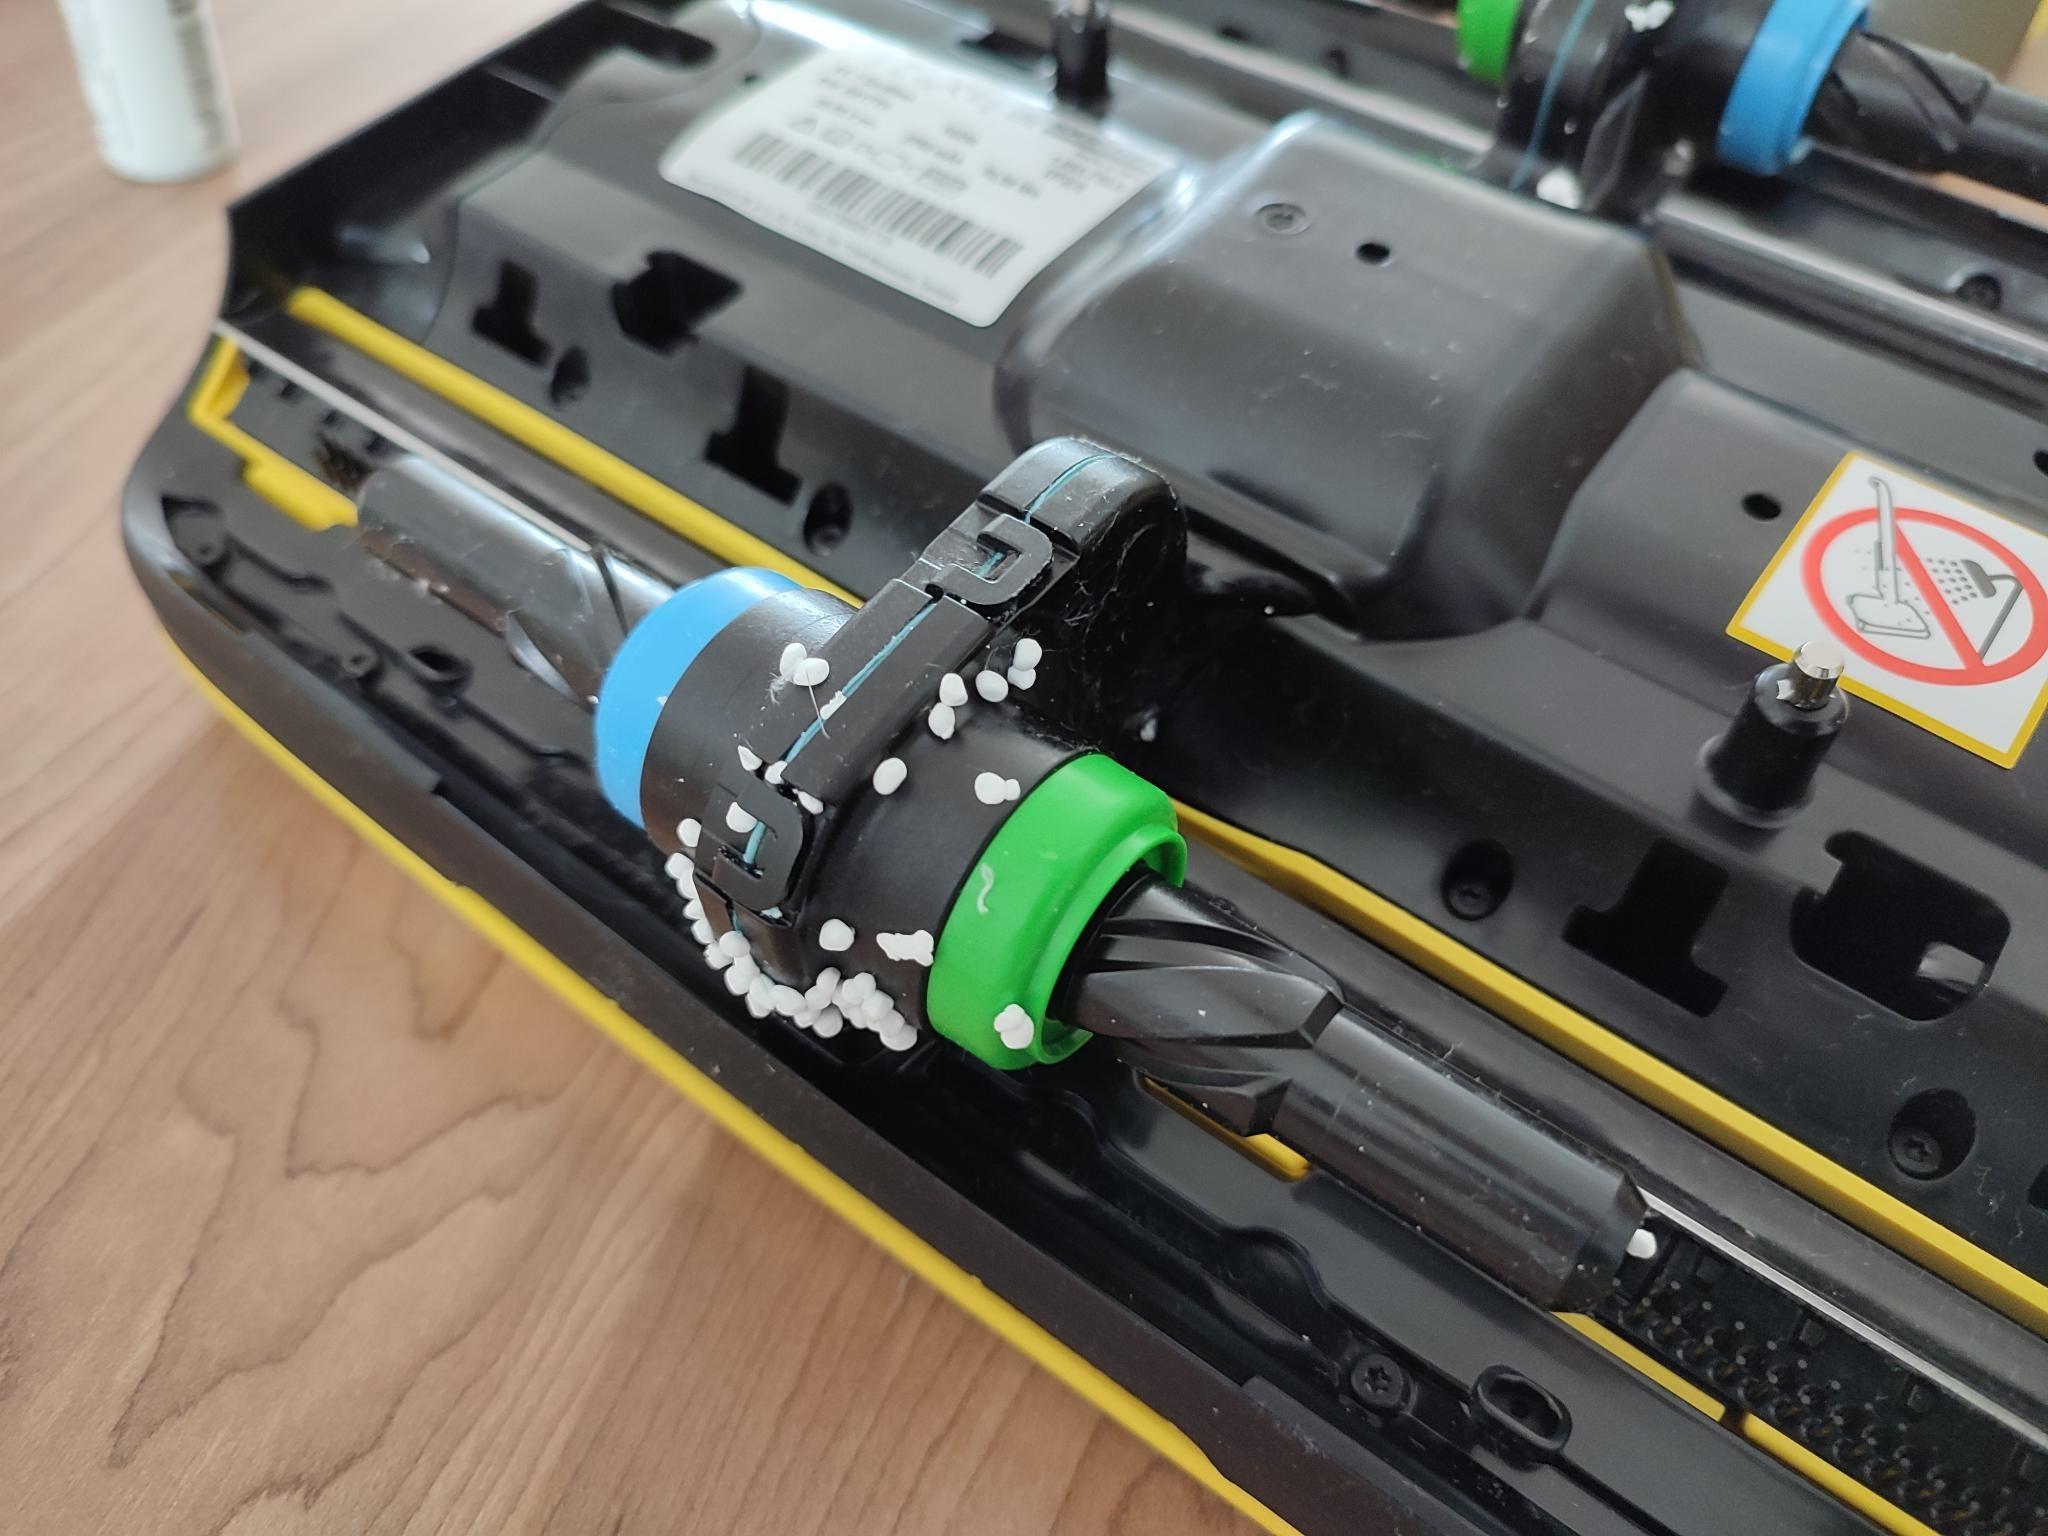 Kärcher FC7 Cordless Hartbodenreiniger Kunststoff Verpackung